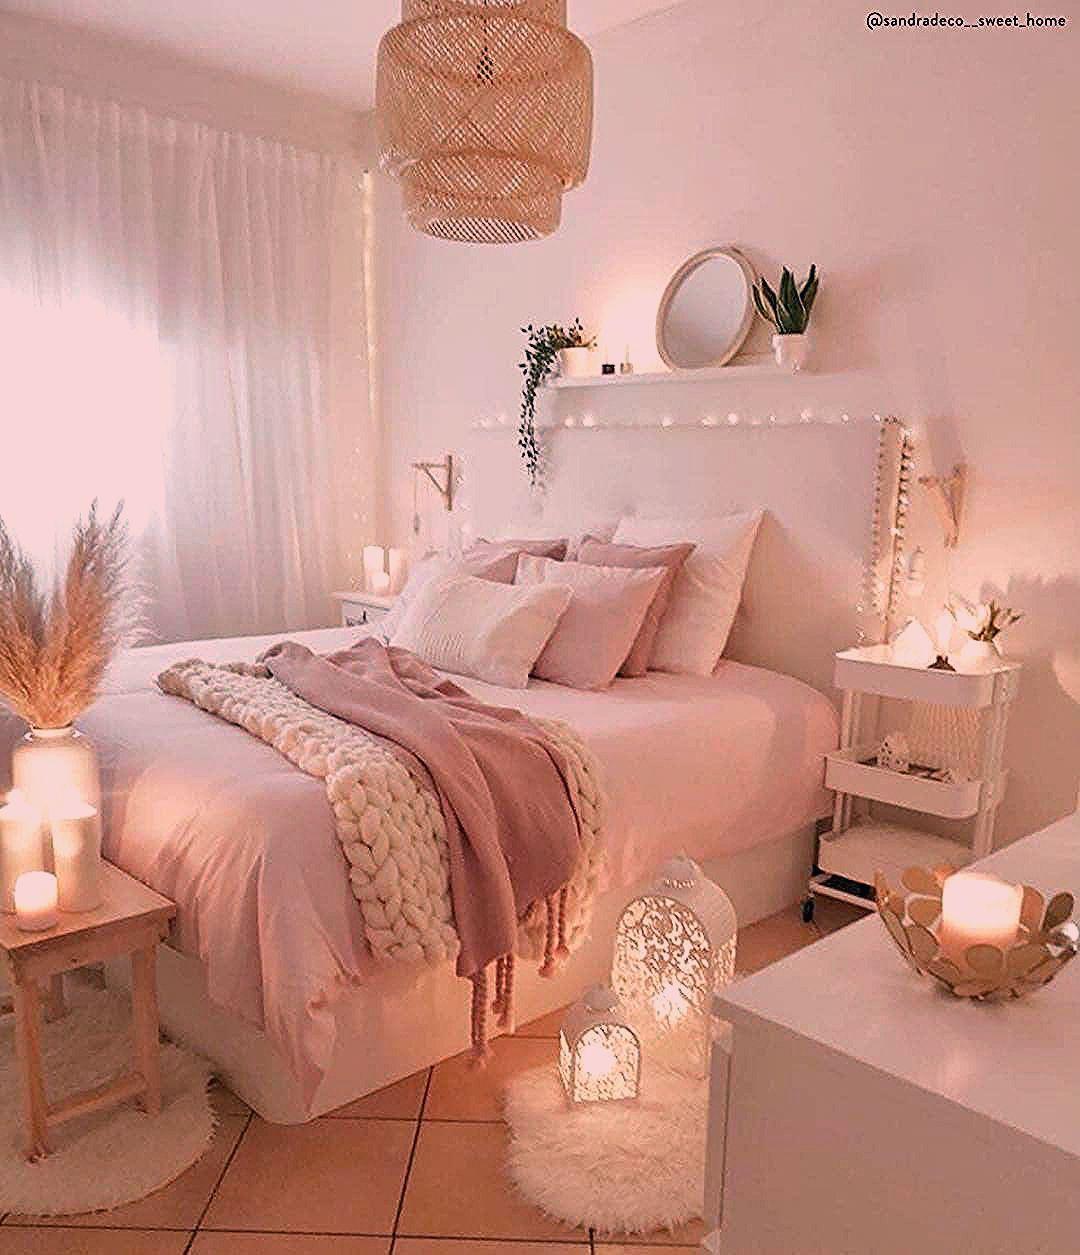 bedroom decor and storage #bedroom decor stores near me #bedroom